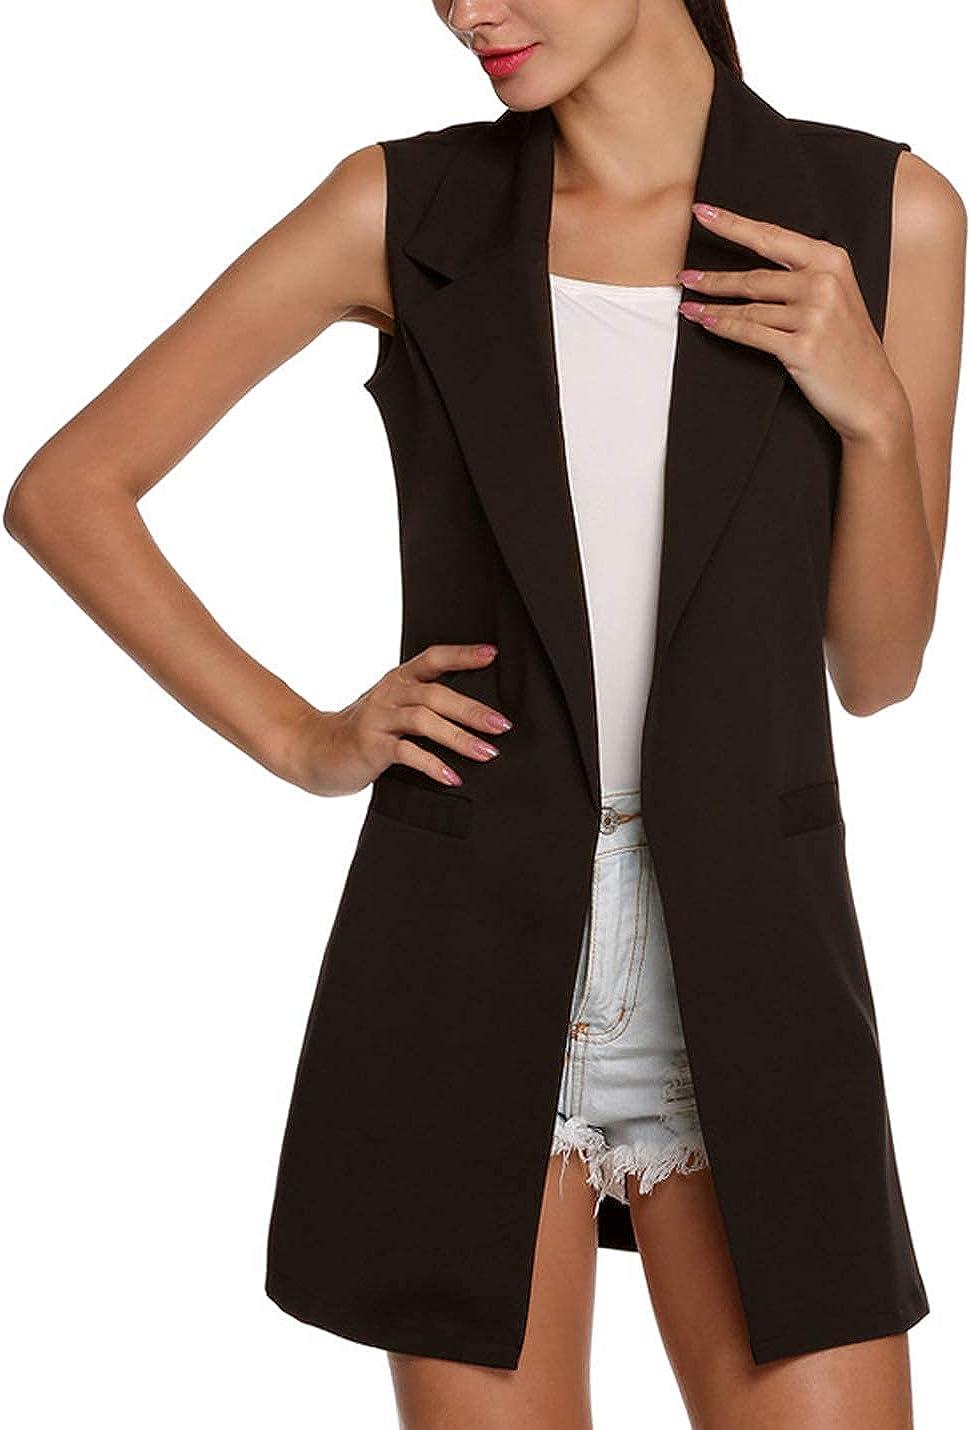 Yimoon Women's Lapel Collar Sleeveless Open Front Long Duster Vest Blazer Jacket